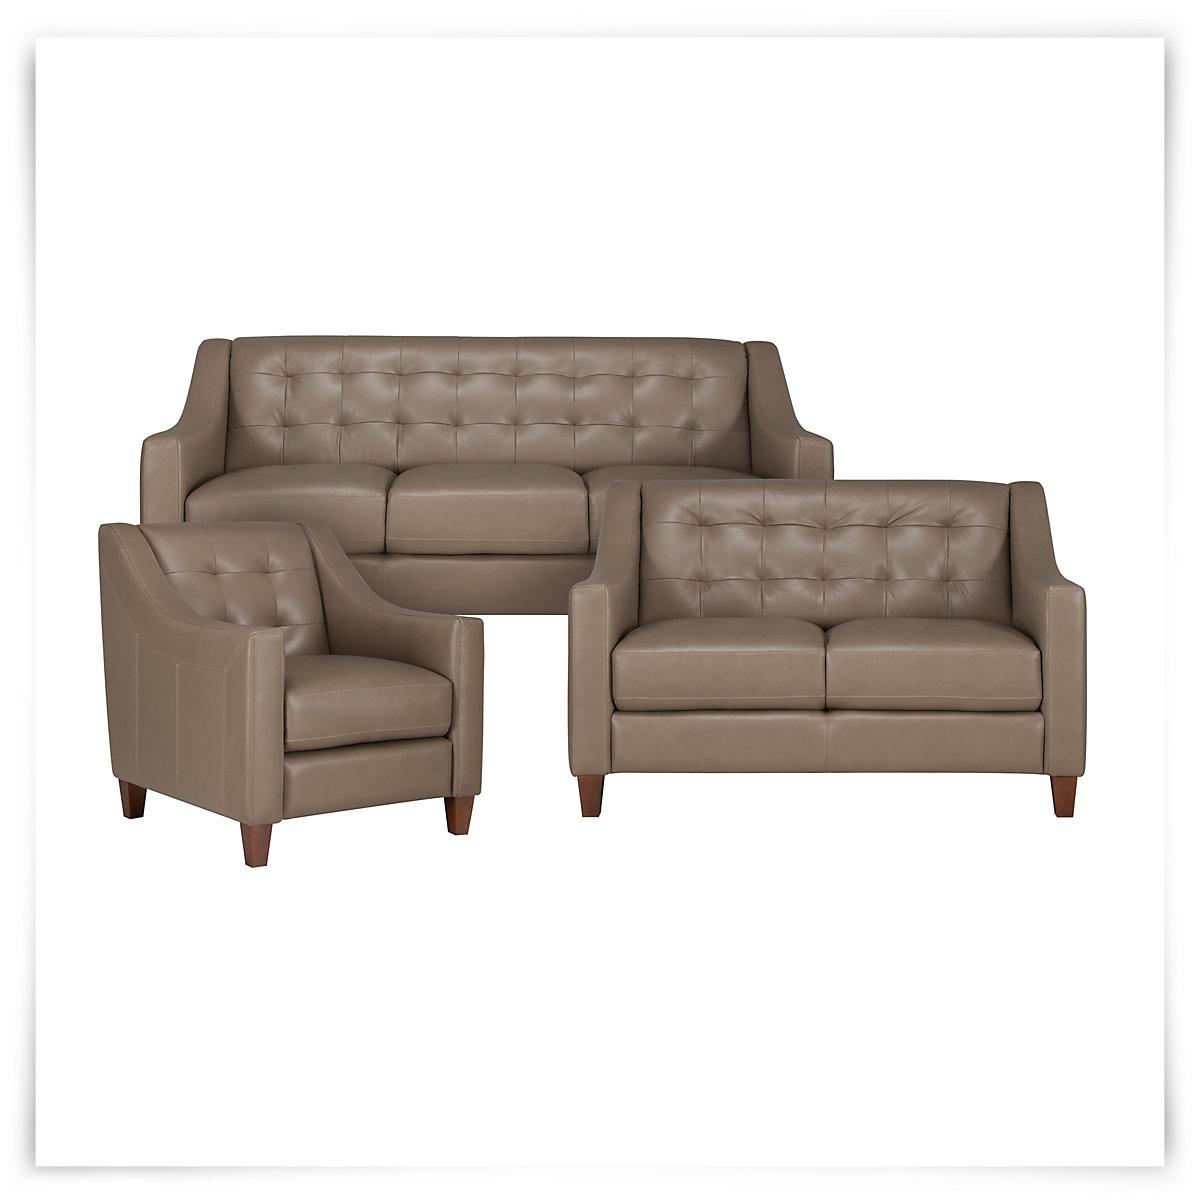 Elise Pewter Leather Living Room